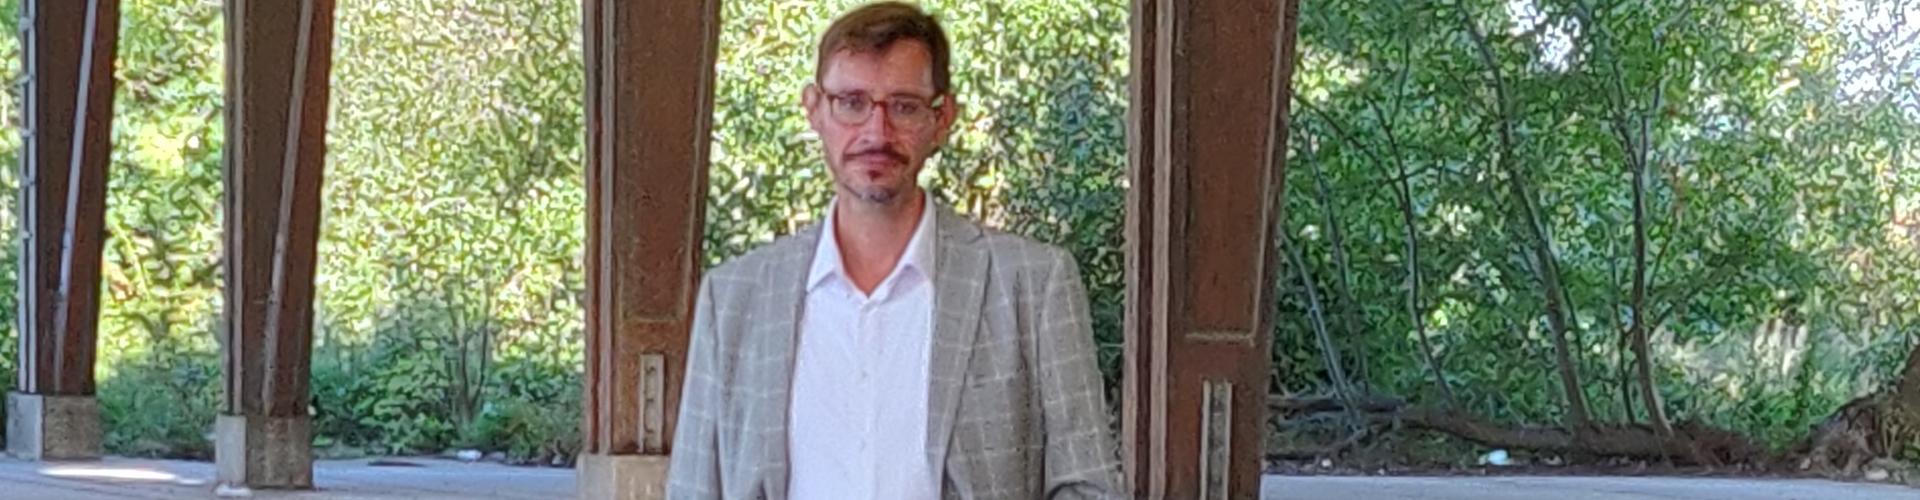 KMO/MKB Bedrijfsadviseur Sven Saerens